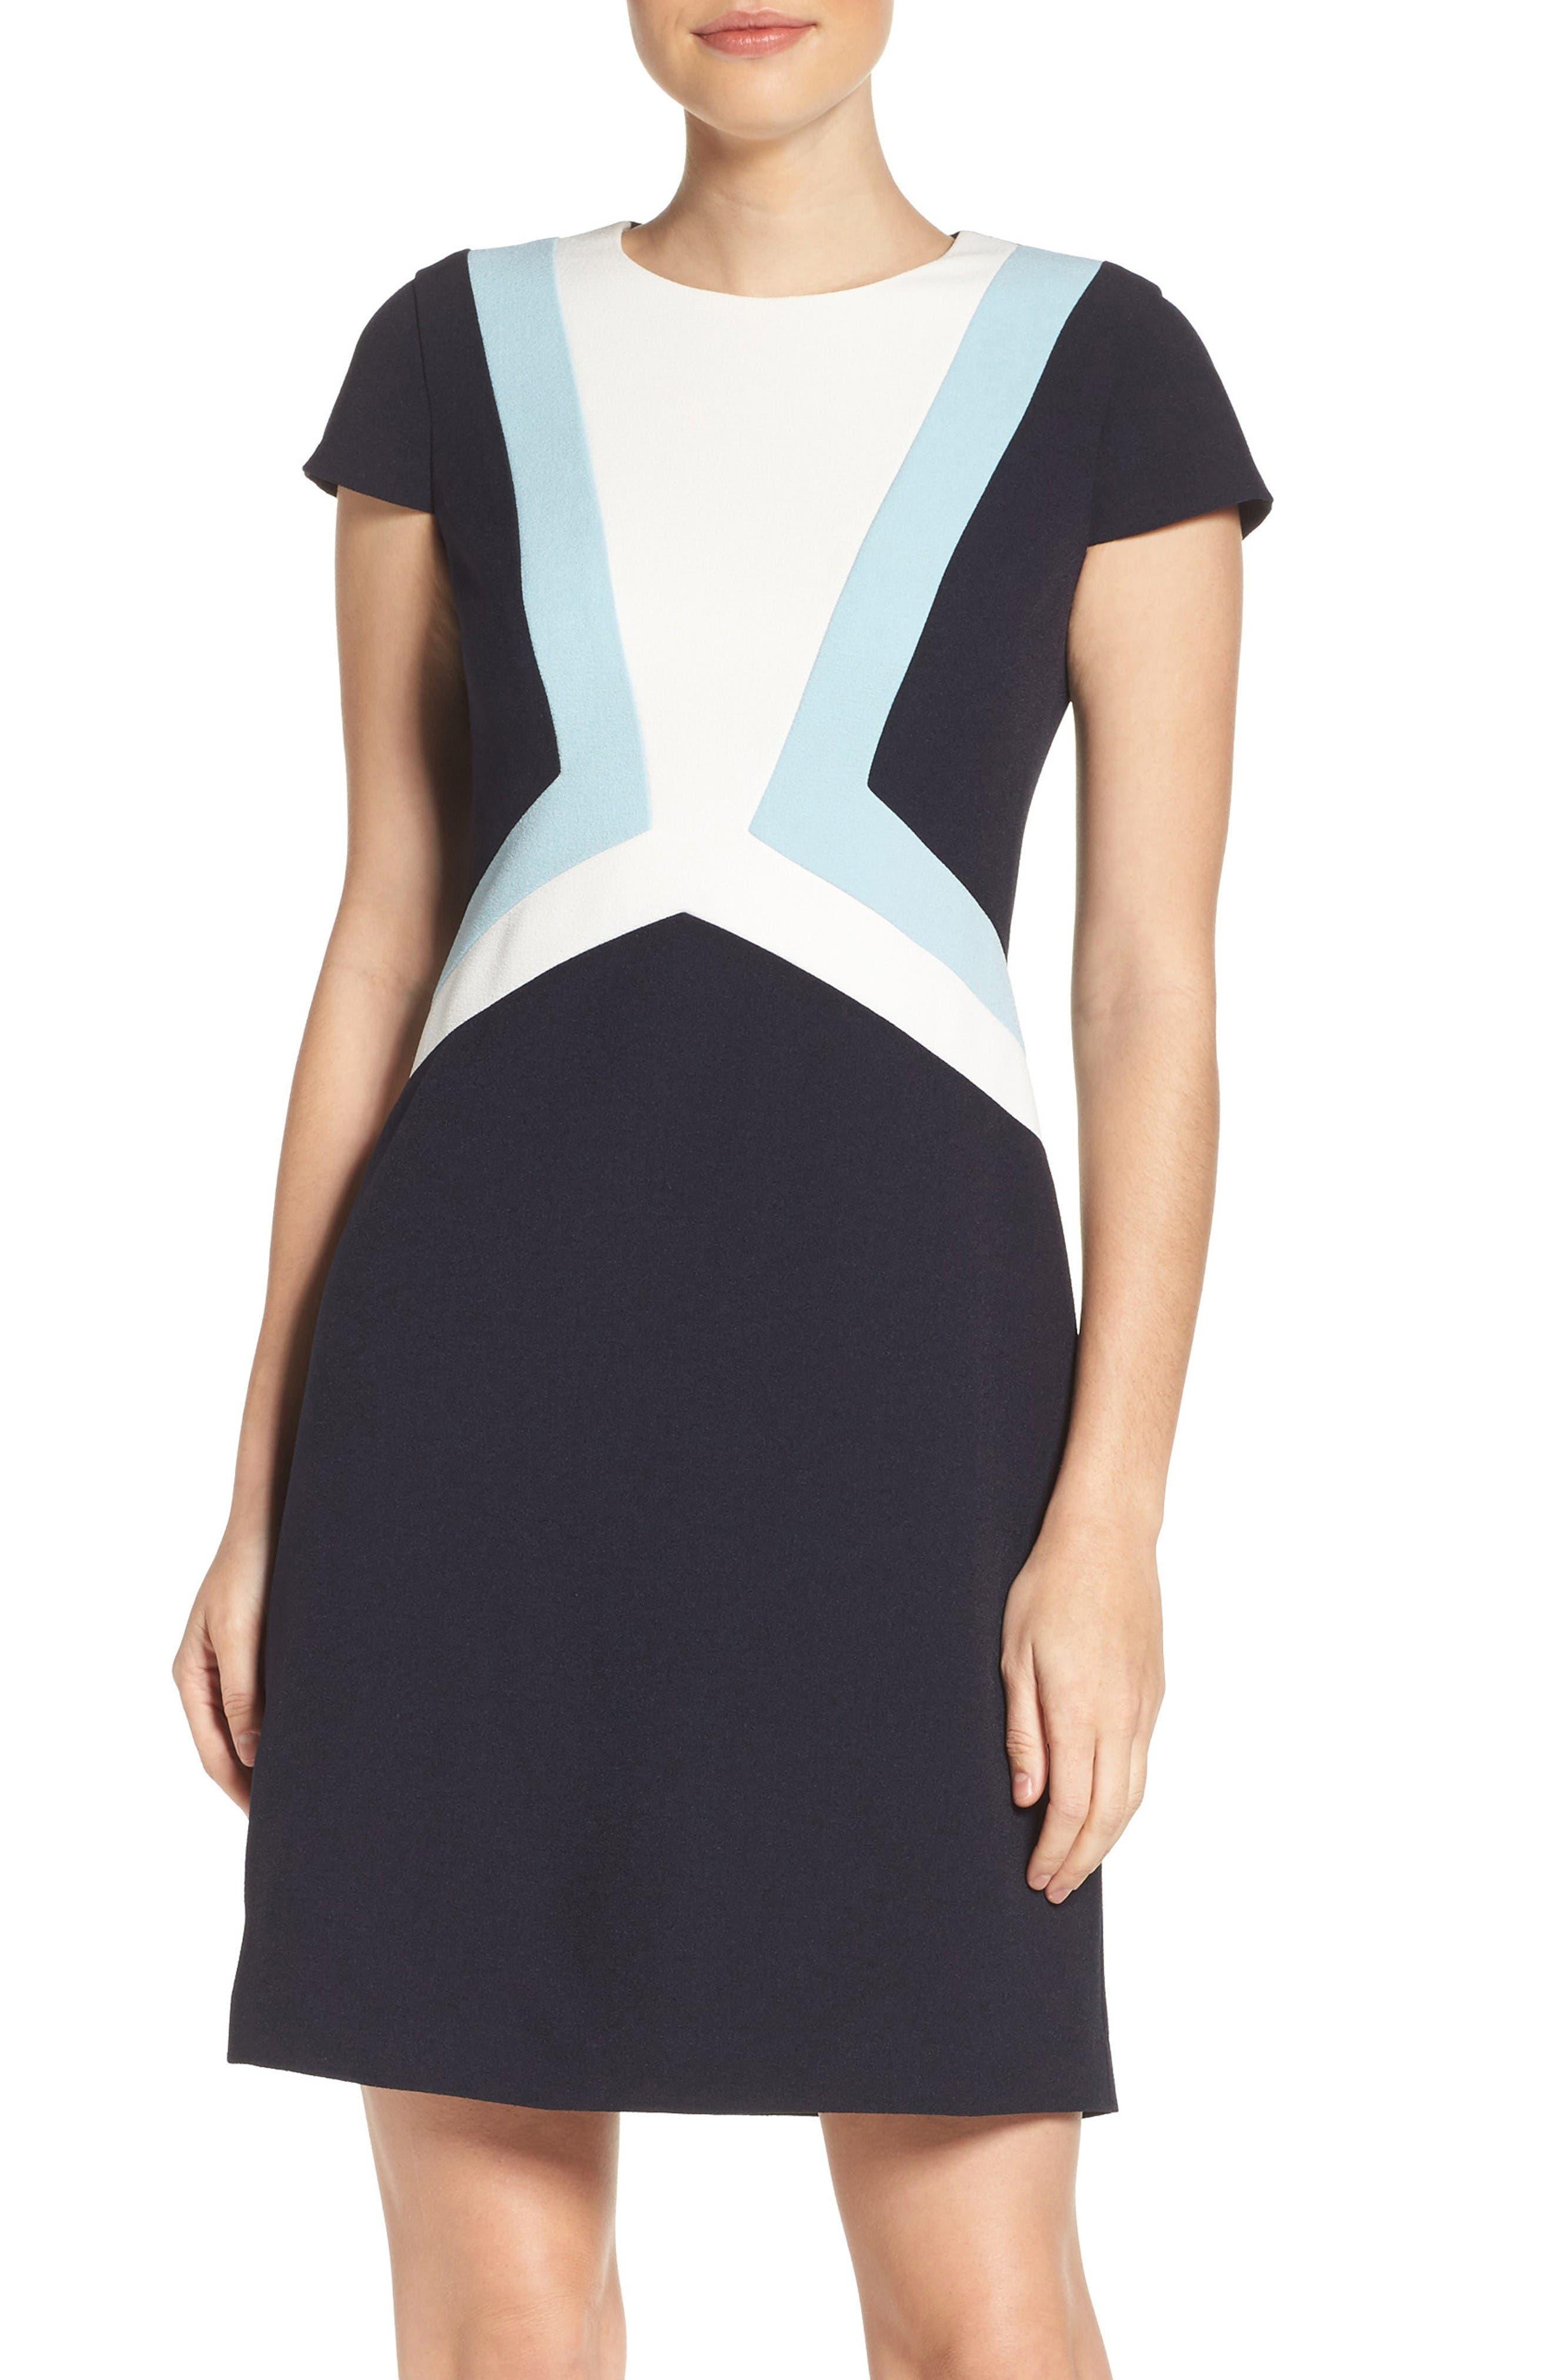 Main Image - Vince Camuto Colorblock Shift Dress (Regular & Petite)